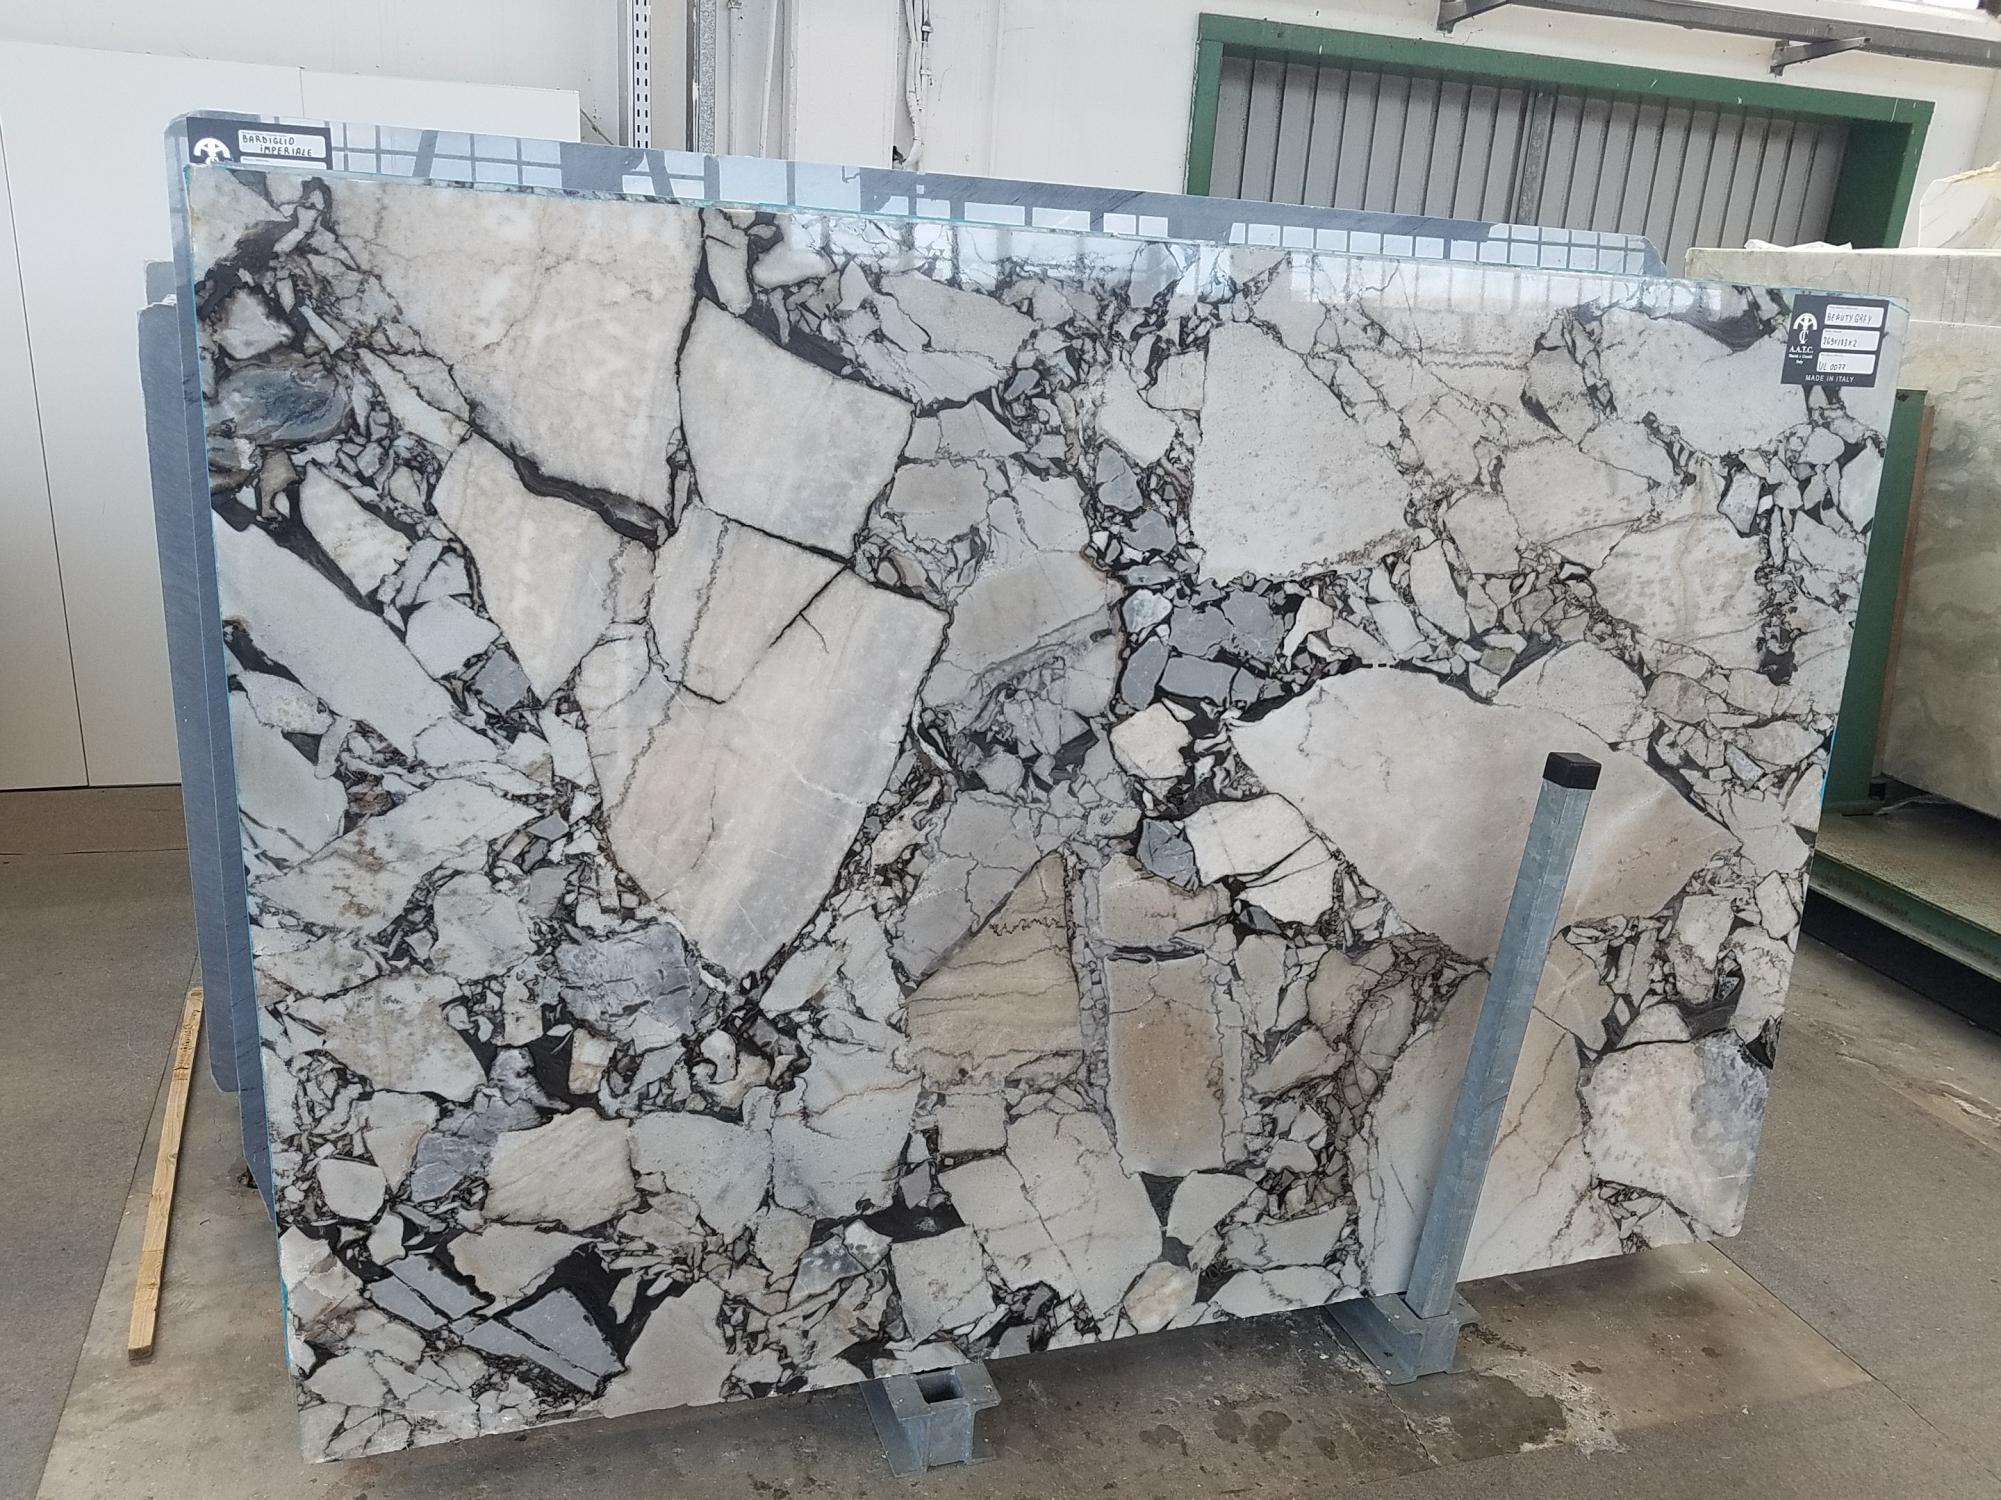 BEAUTY GREY polierte Unmaßplatten UL0077 aus Natur Marmor , SL2: Lieferung Veneto, Italien